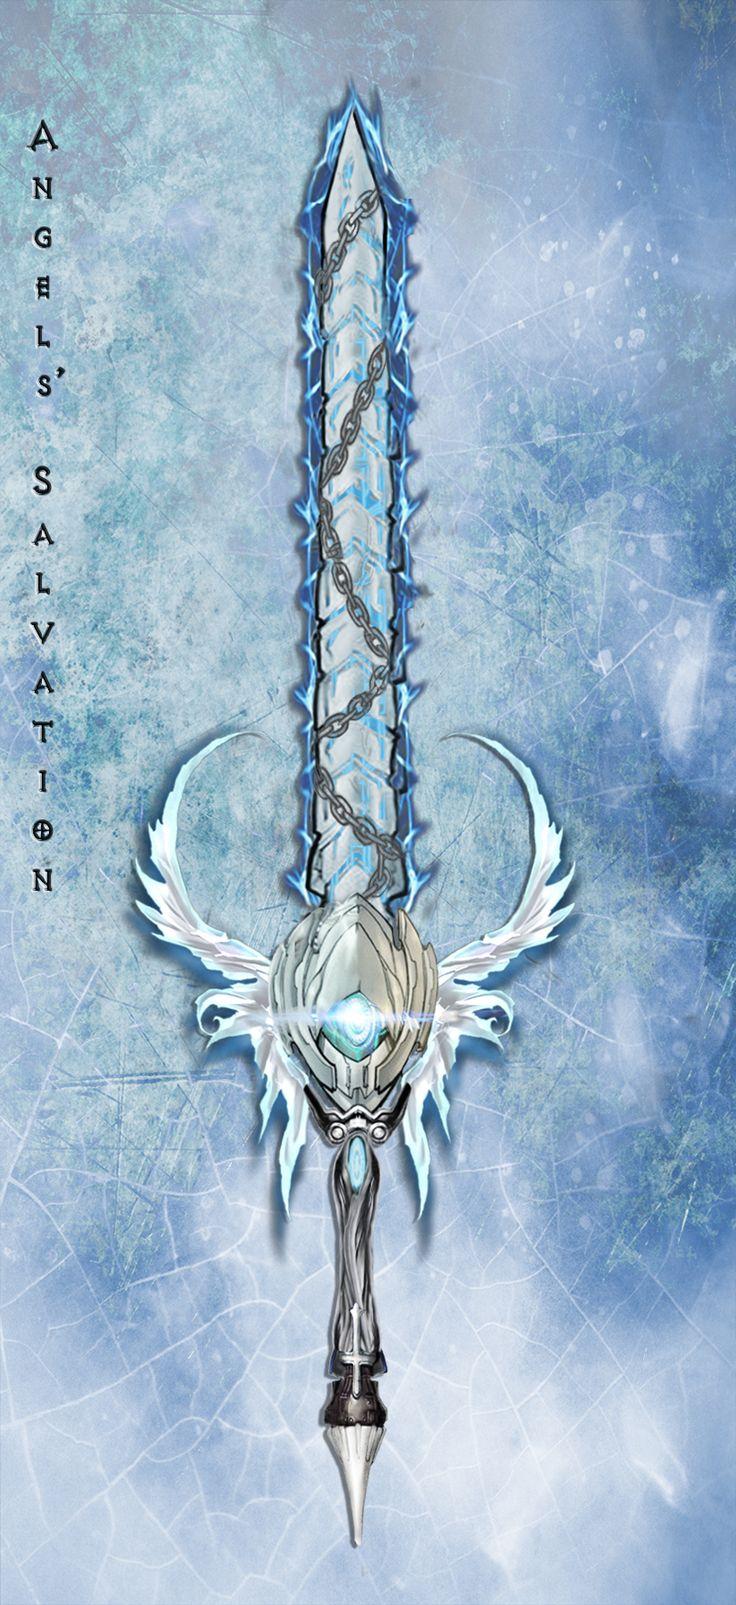 Angel's Salvation: Holy Blade by Unkn0wnfear.deviantart.com on @DeviantArt